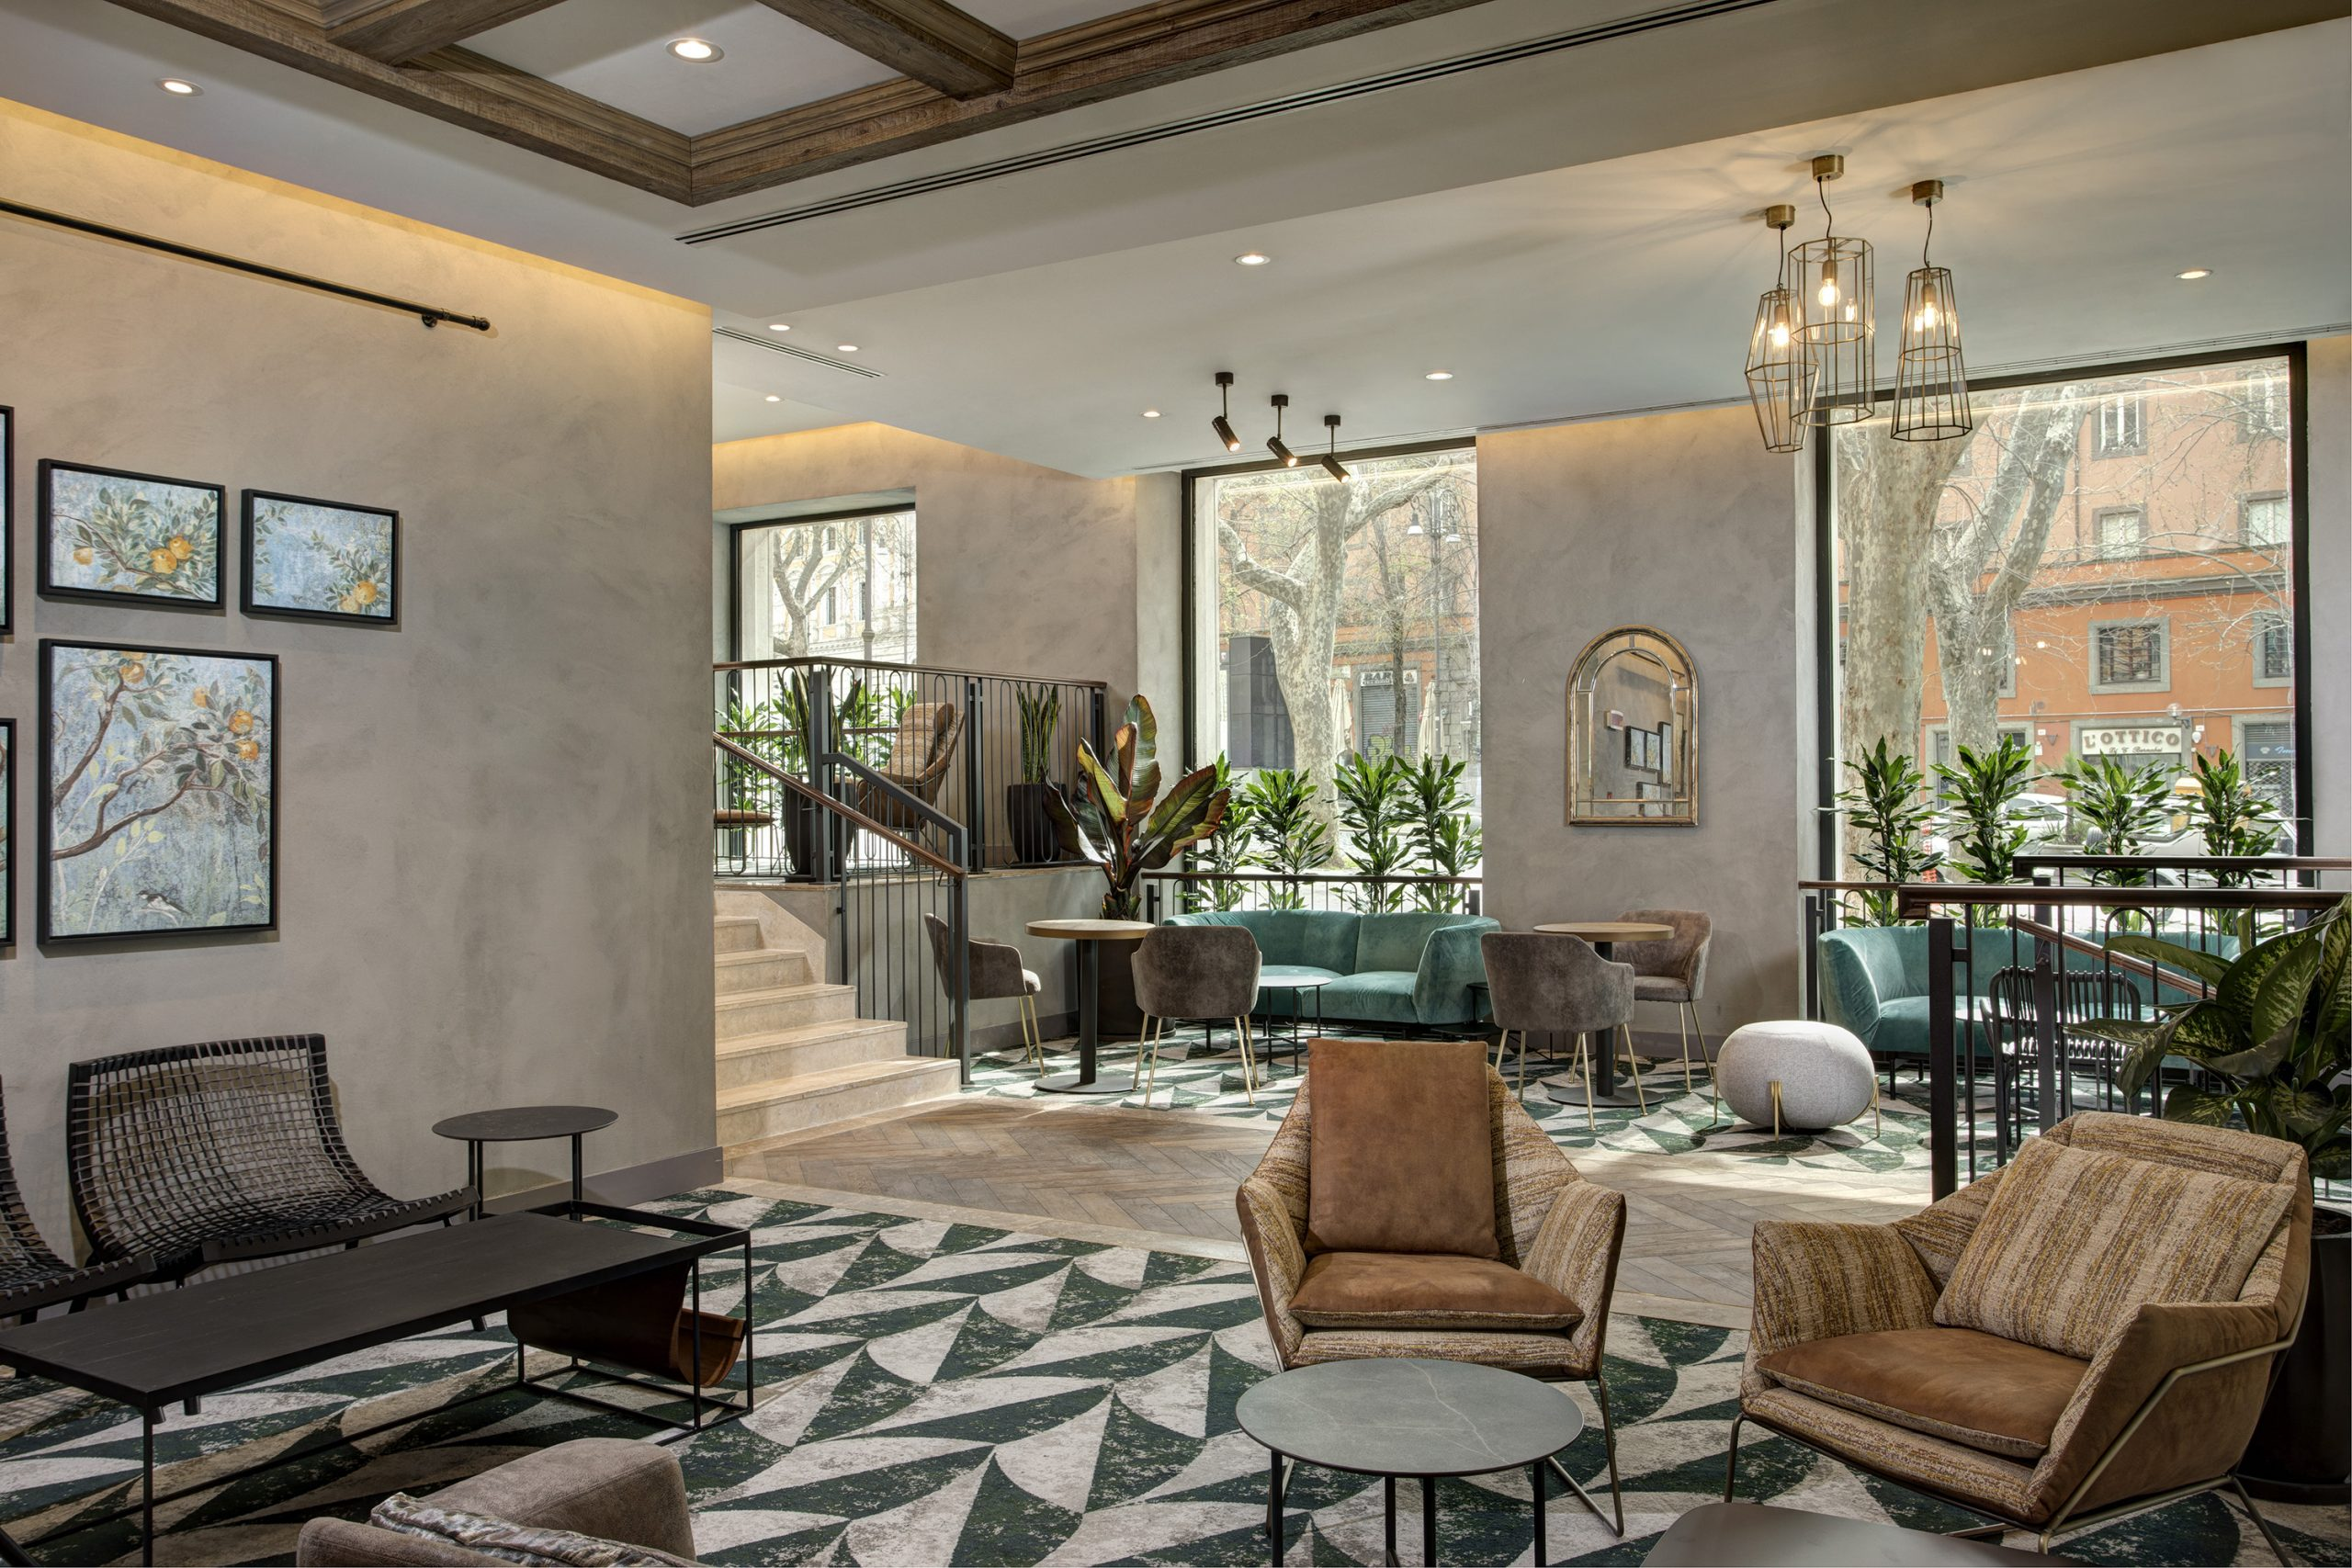 Hotel Plublic Spaces - D-1505